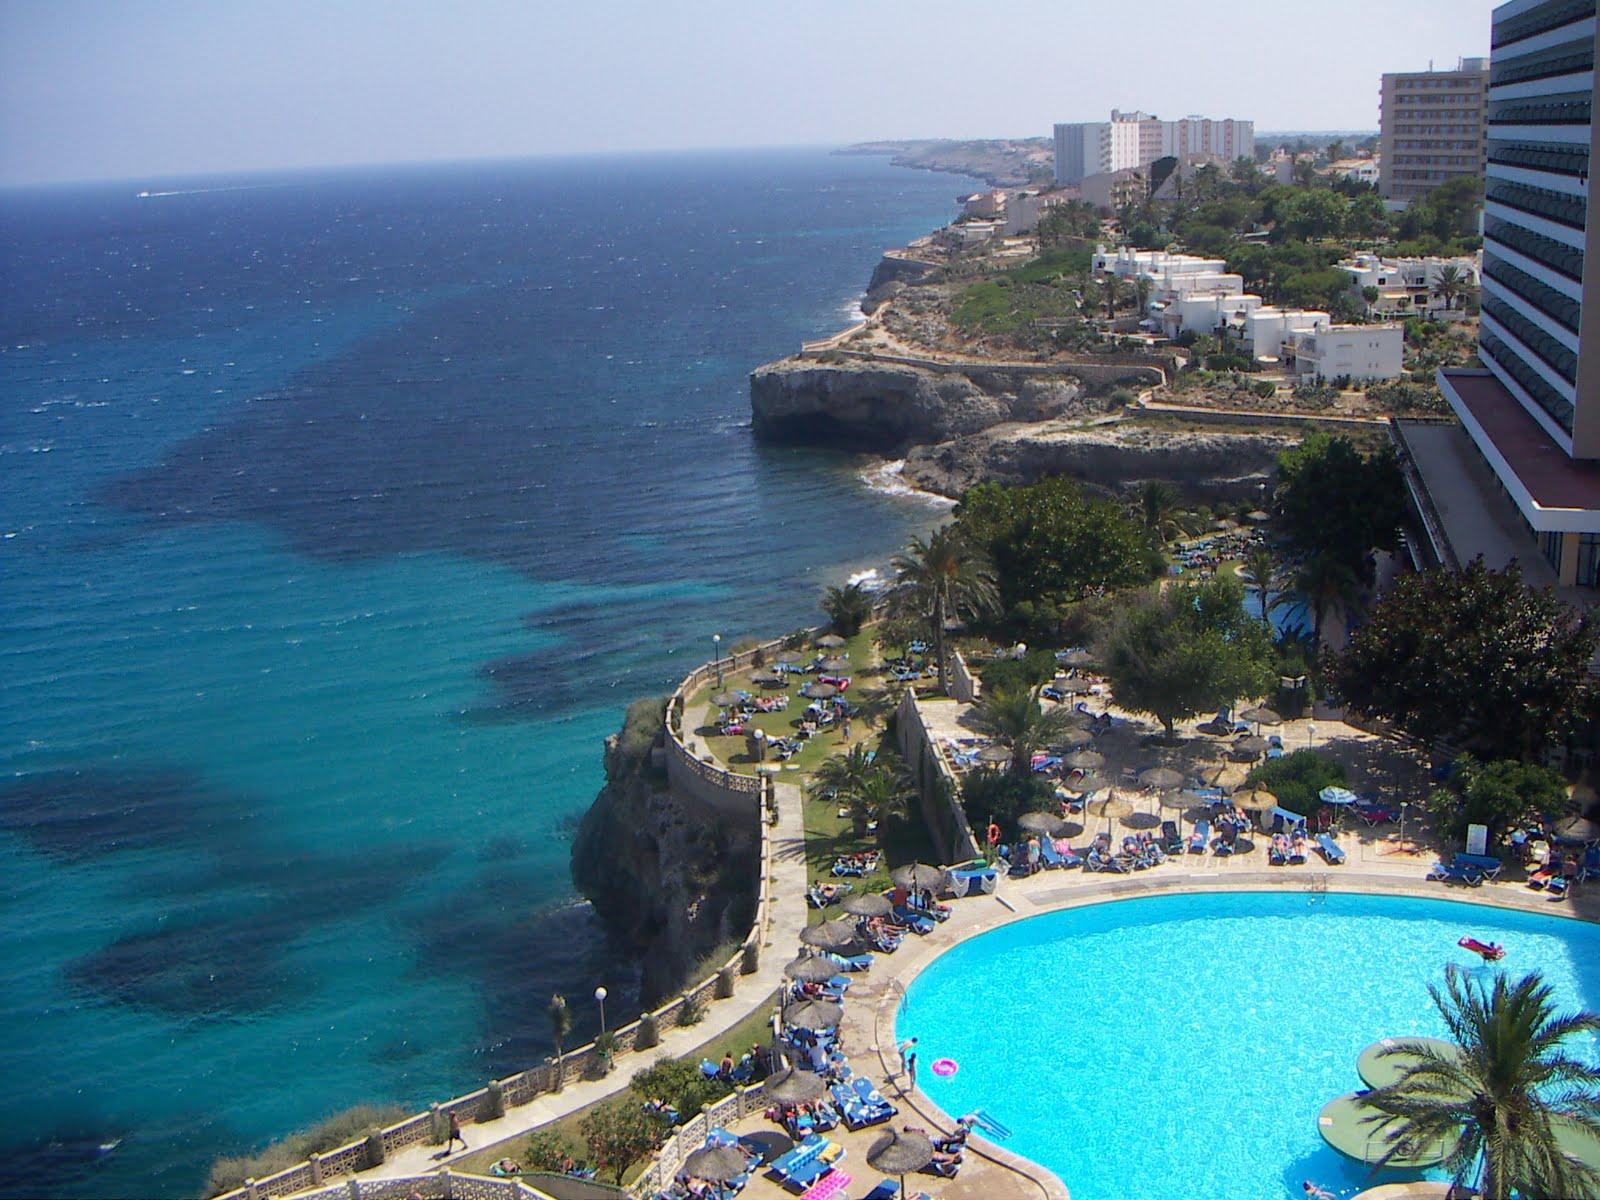 Tourism: Palma de Mallorca Spain